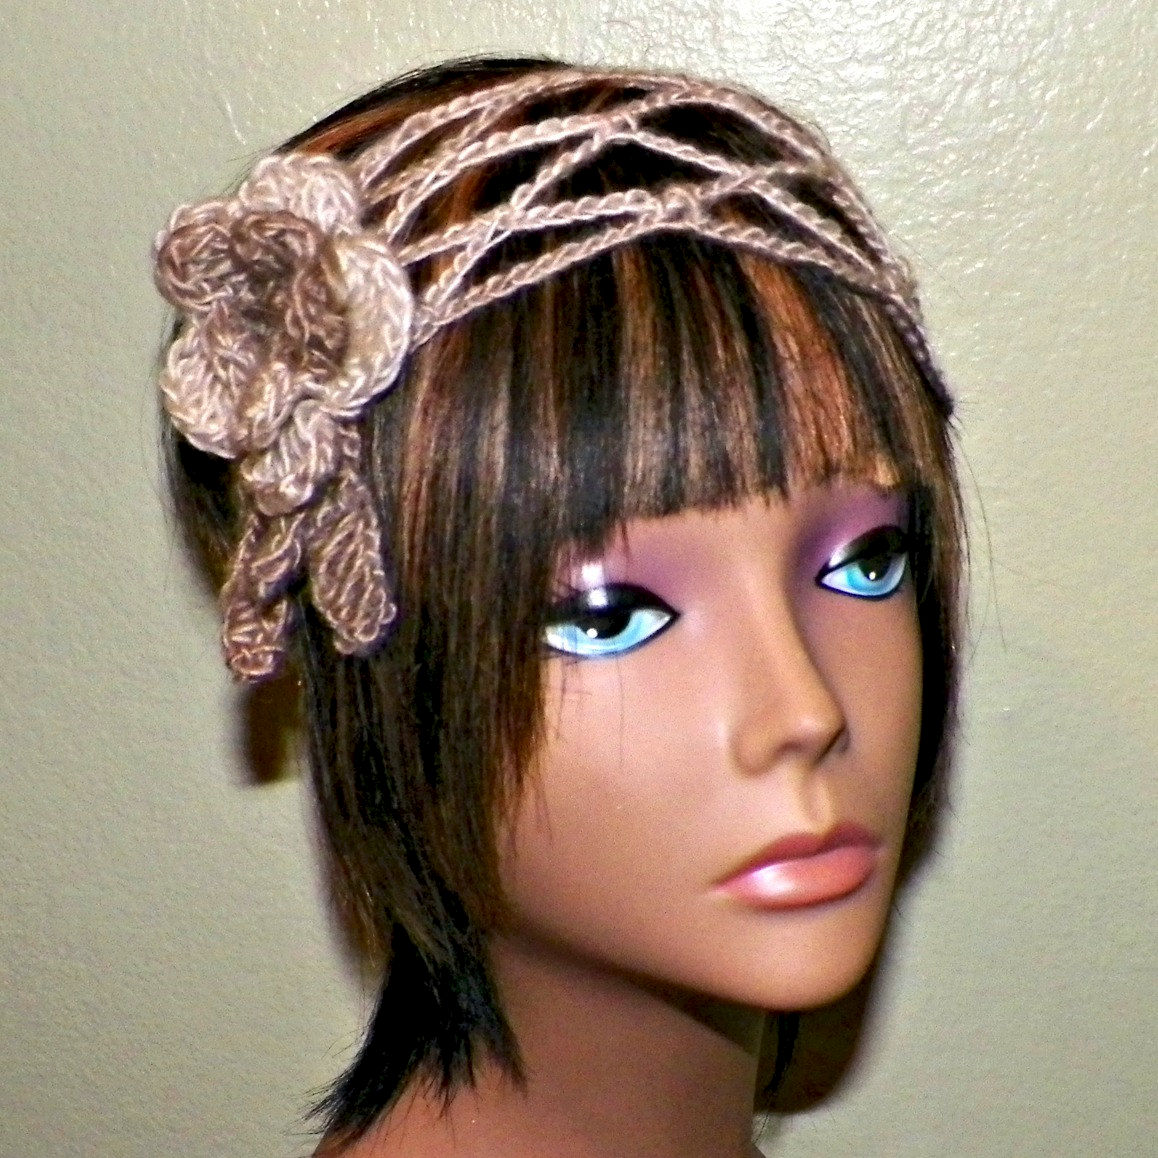 Flower Headband Mesh Hippie Boho Gypsy Earthtone Crochet Hair Band